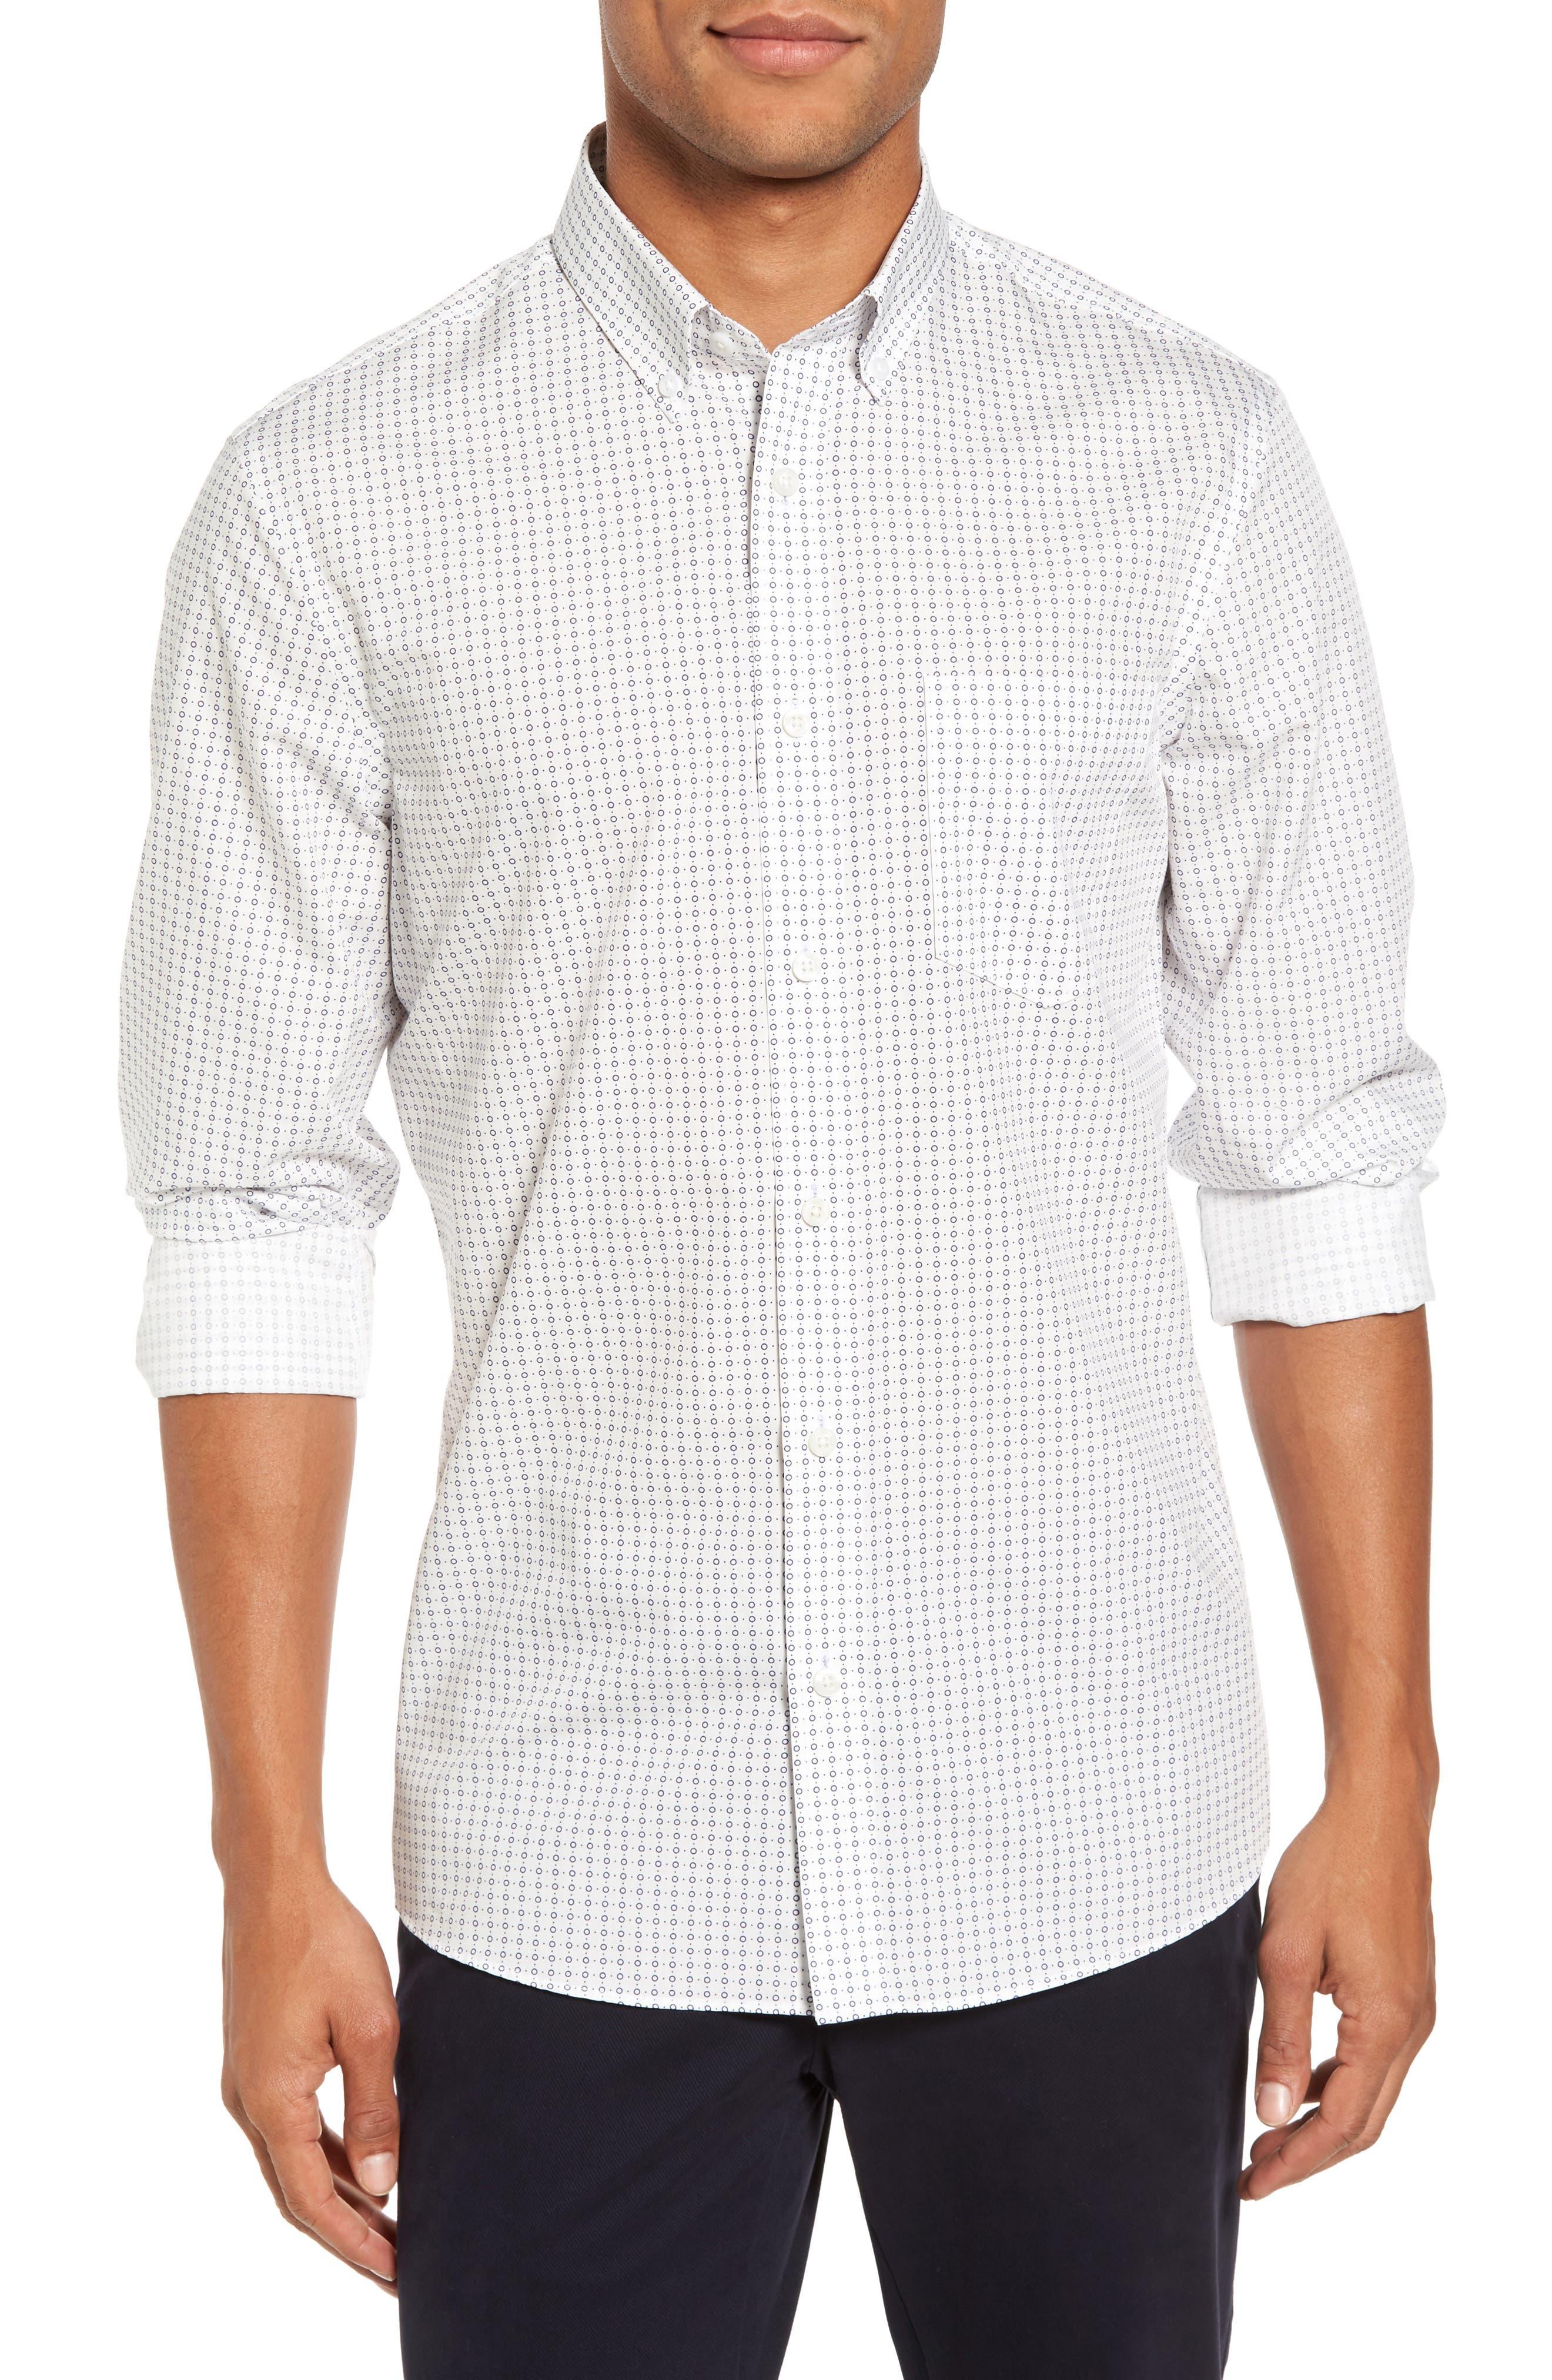 Nordstrom Men's Shop Trim Fit Non-Iron Circle Print Sport Shirt